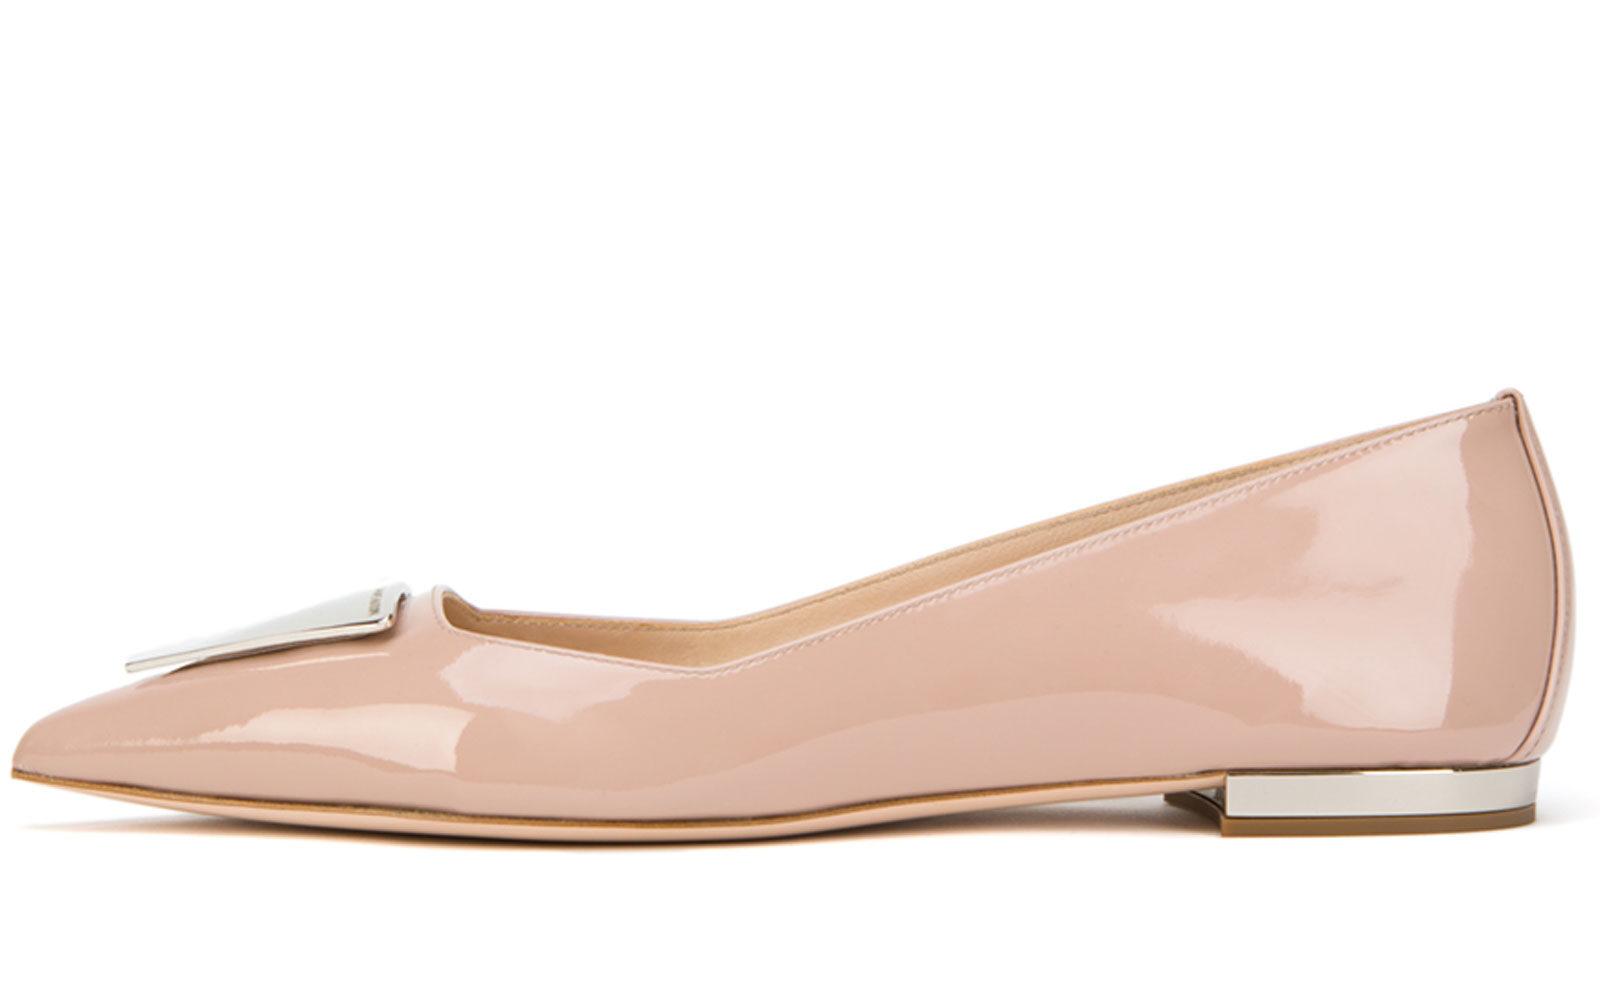 Damiano-Marini-Flat-pump-leather-and-silver-accessory-350-euro